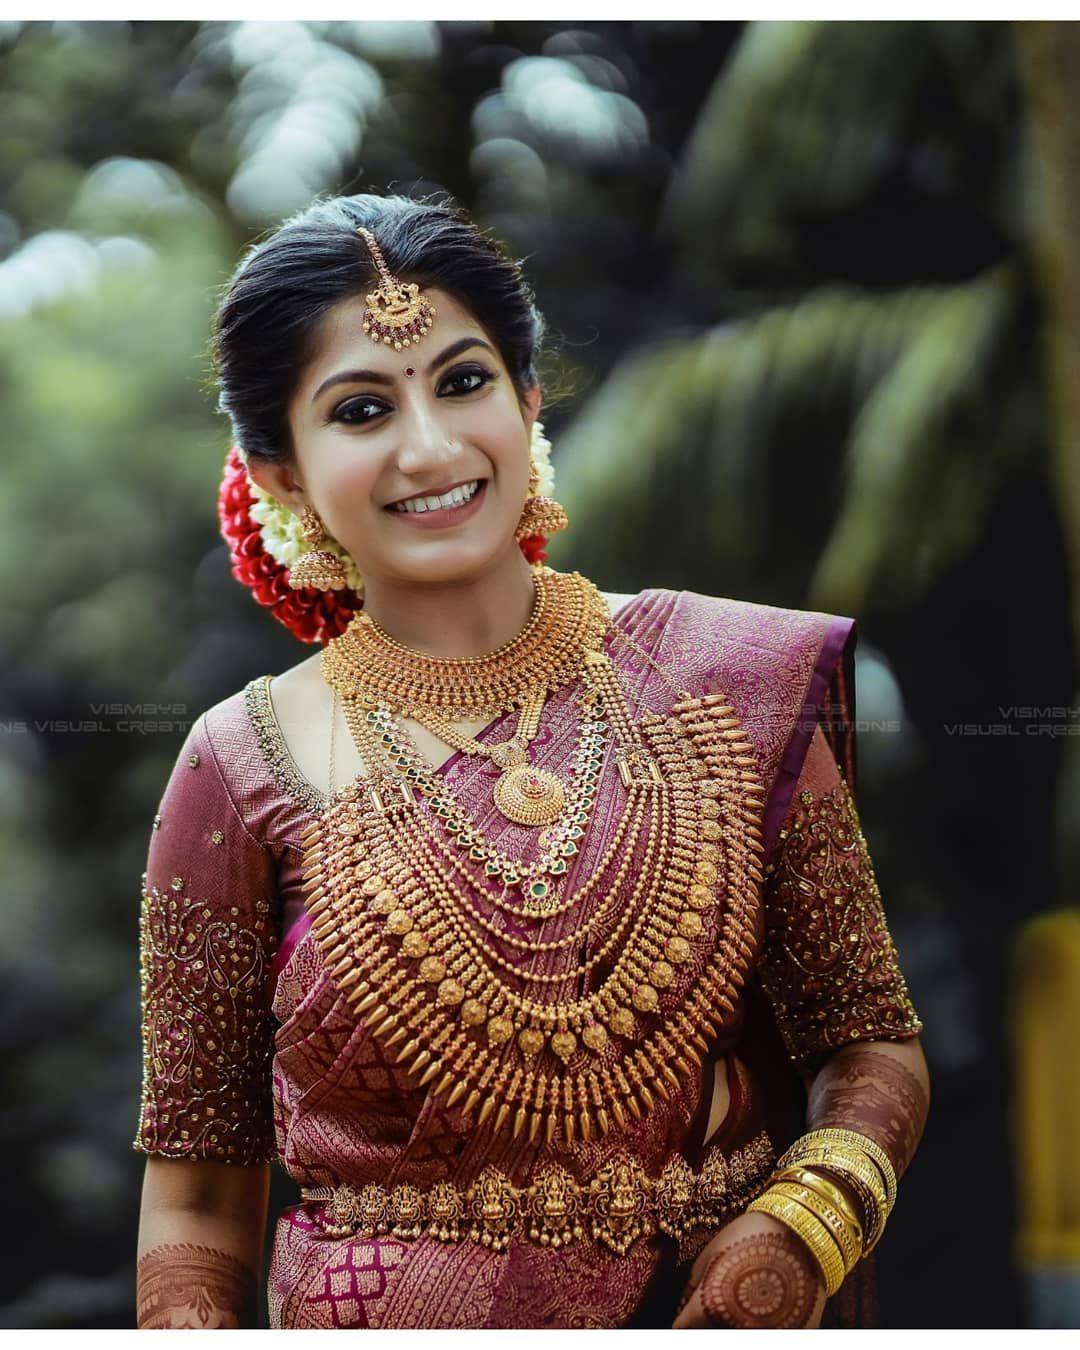 "Photo of KERALA BRIDES on Instagram: ""Bride: Ancy Sasidharan Mua: Jo makeup artist Saree: Seematti, Kochi Photography: Vismaya visual creations . . . . To get featured send…"""